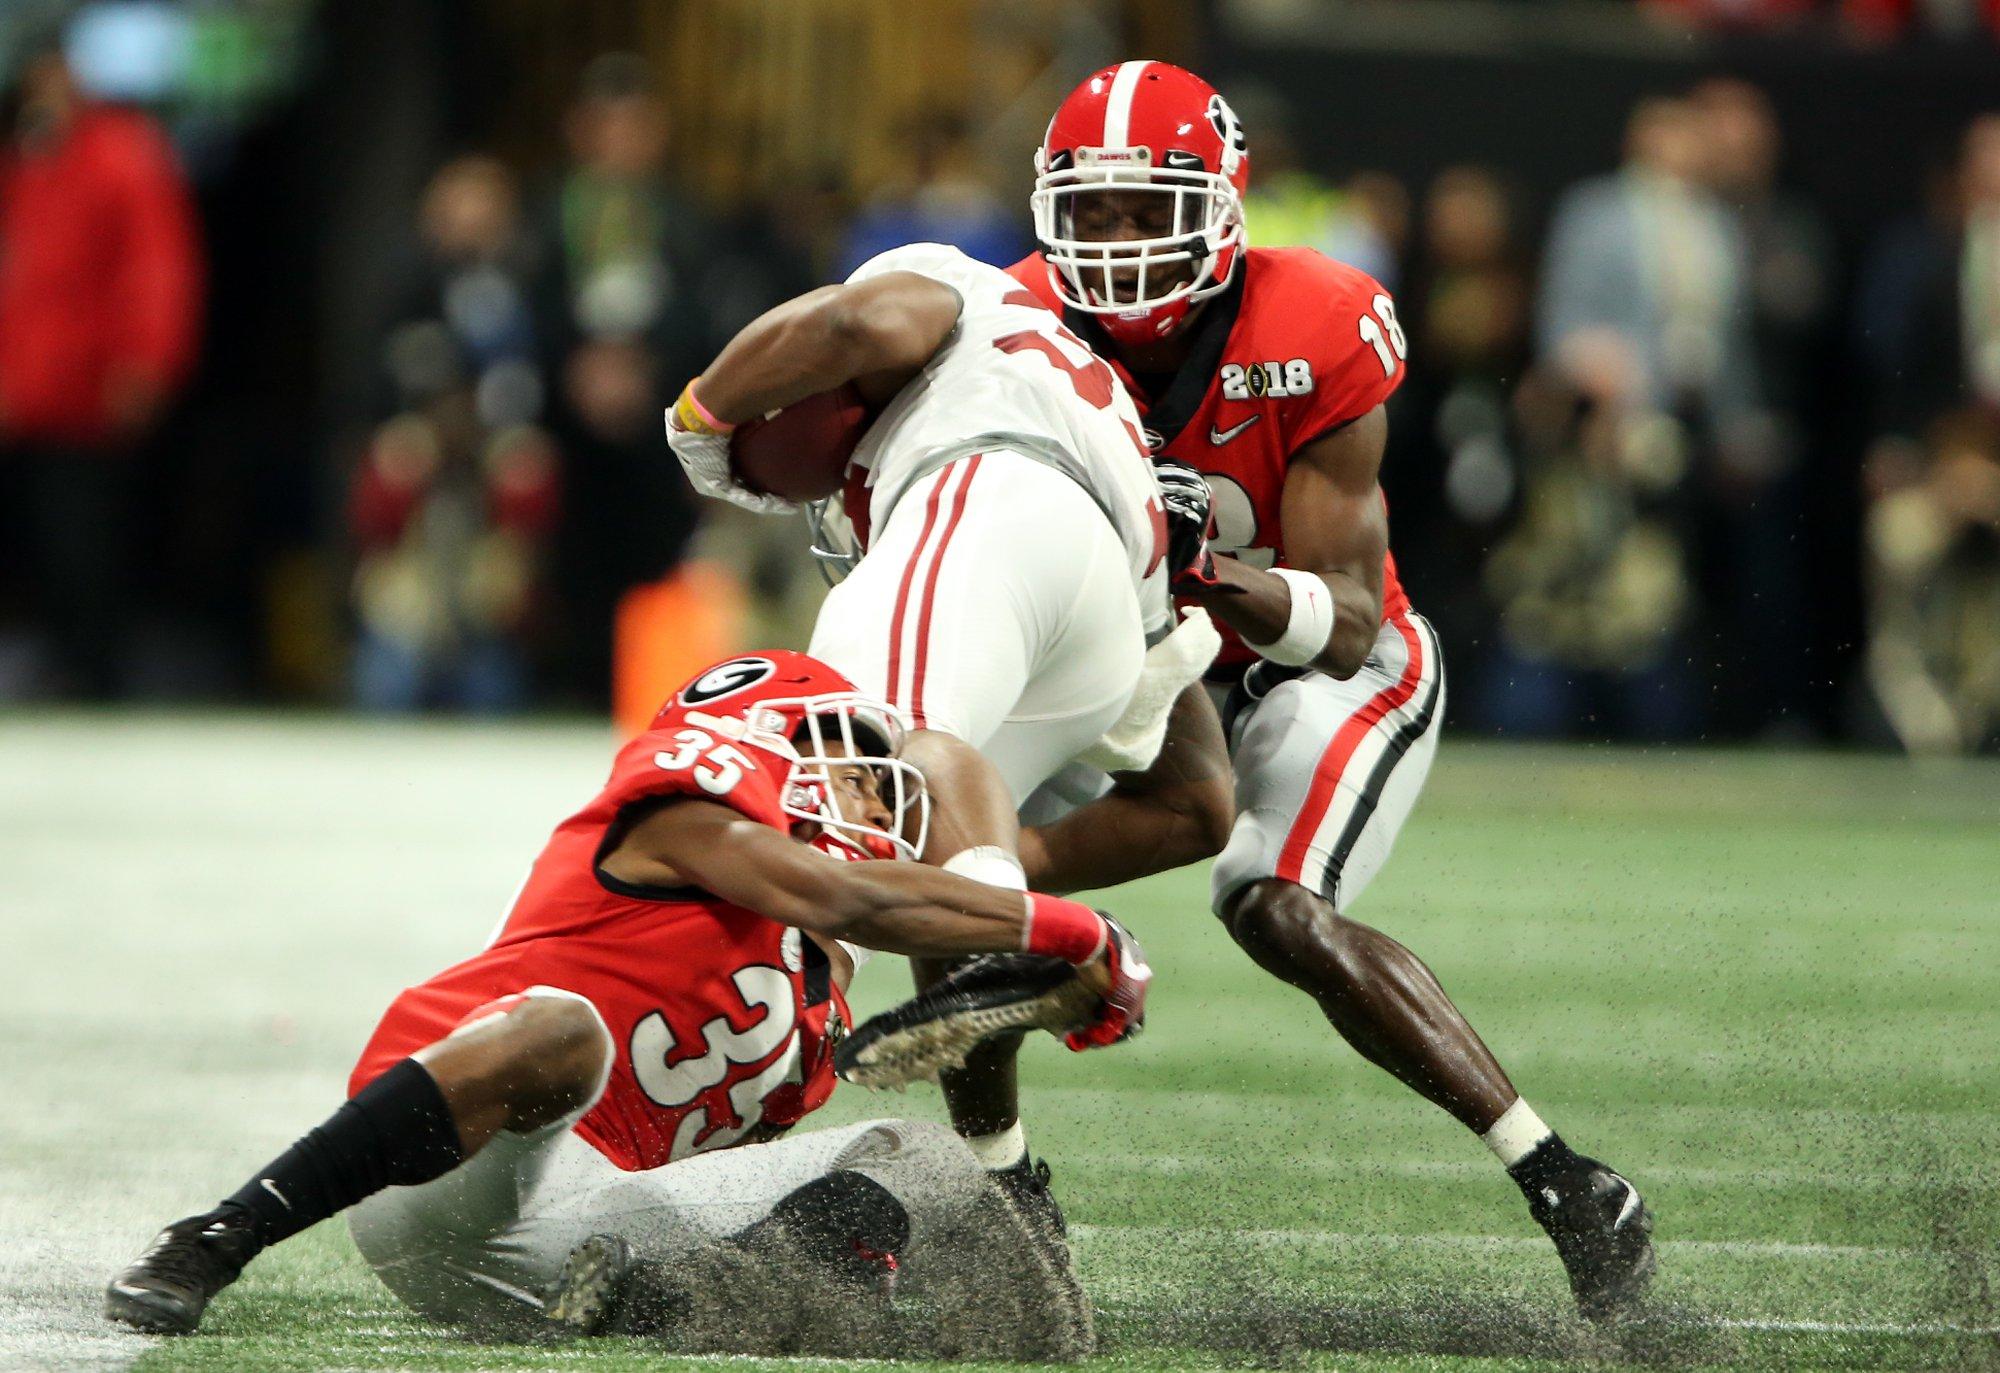 Georgia's Aaron Davis makes a tackle